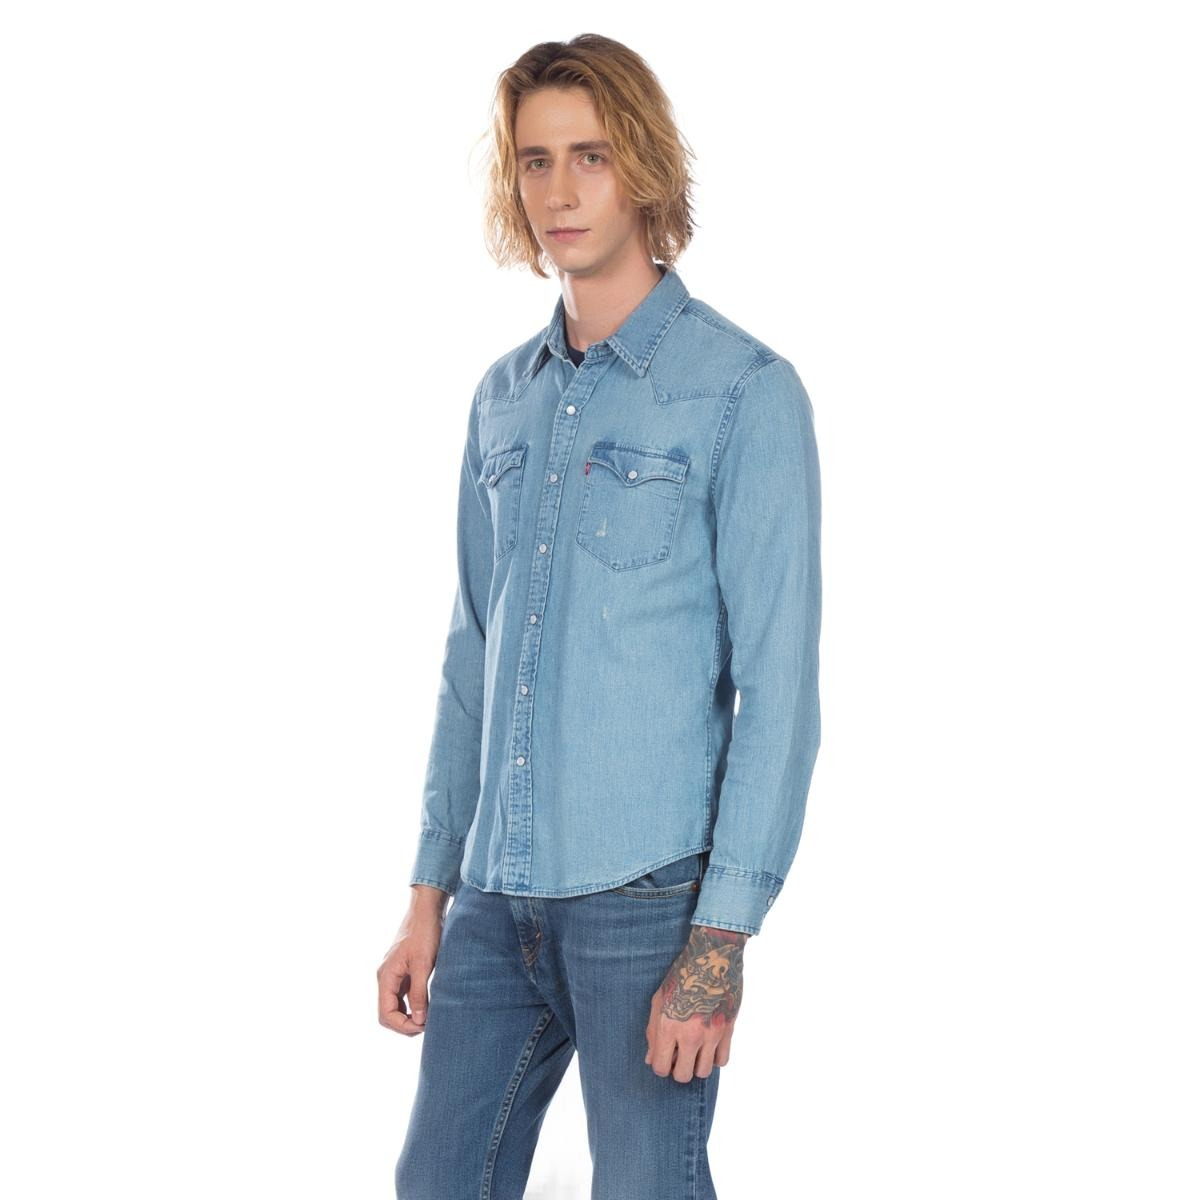 camisa levis jeans masculino classic western azul claro. Carregando zoom. c0fbb1dbec6